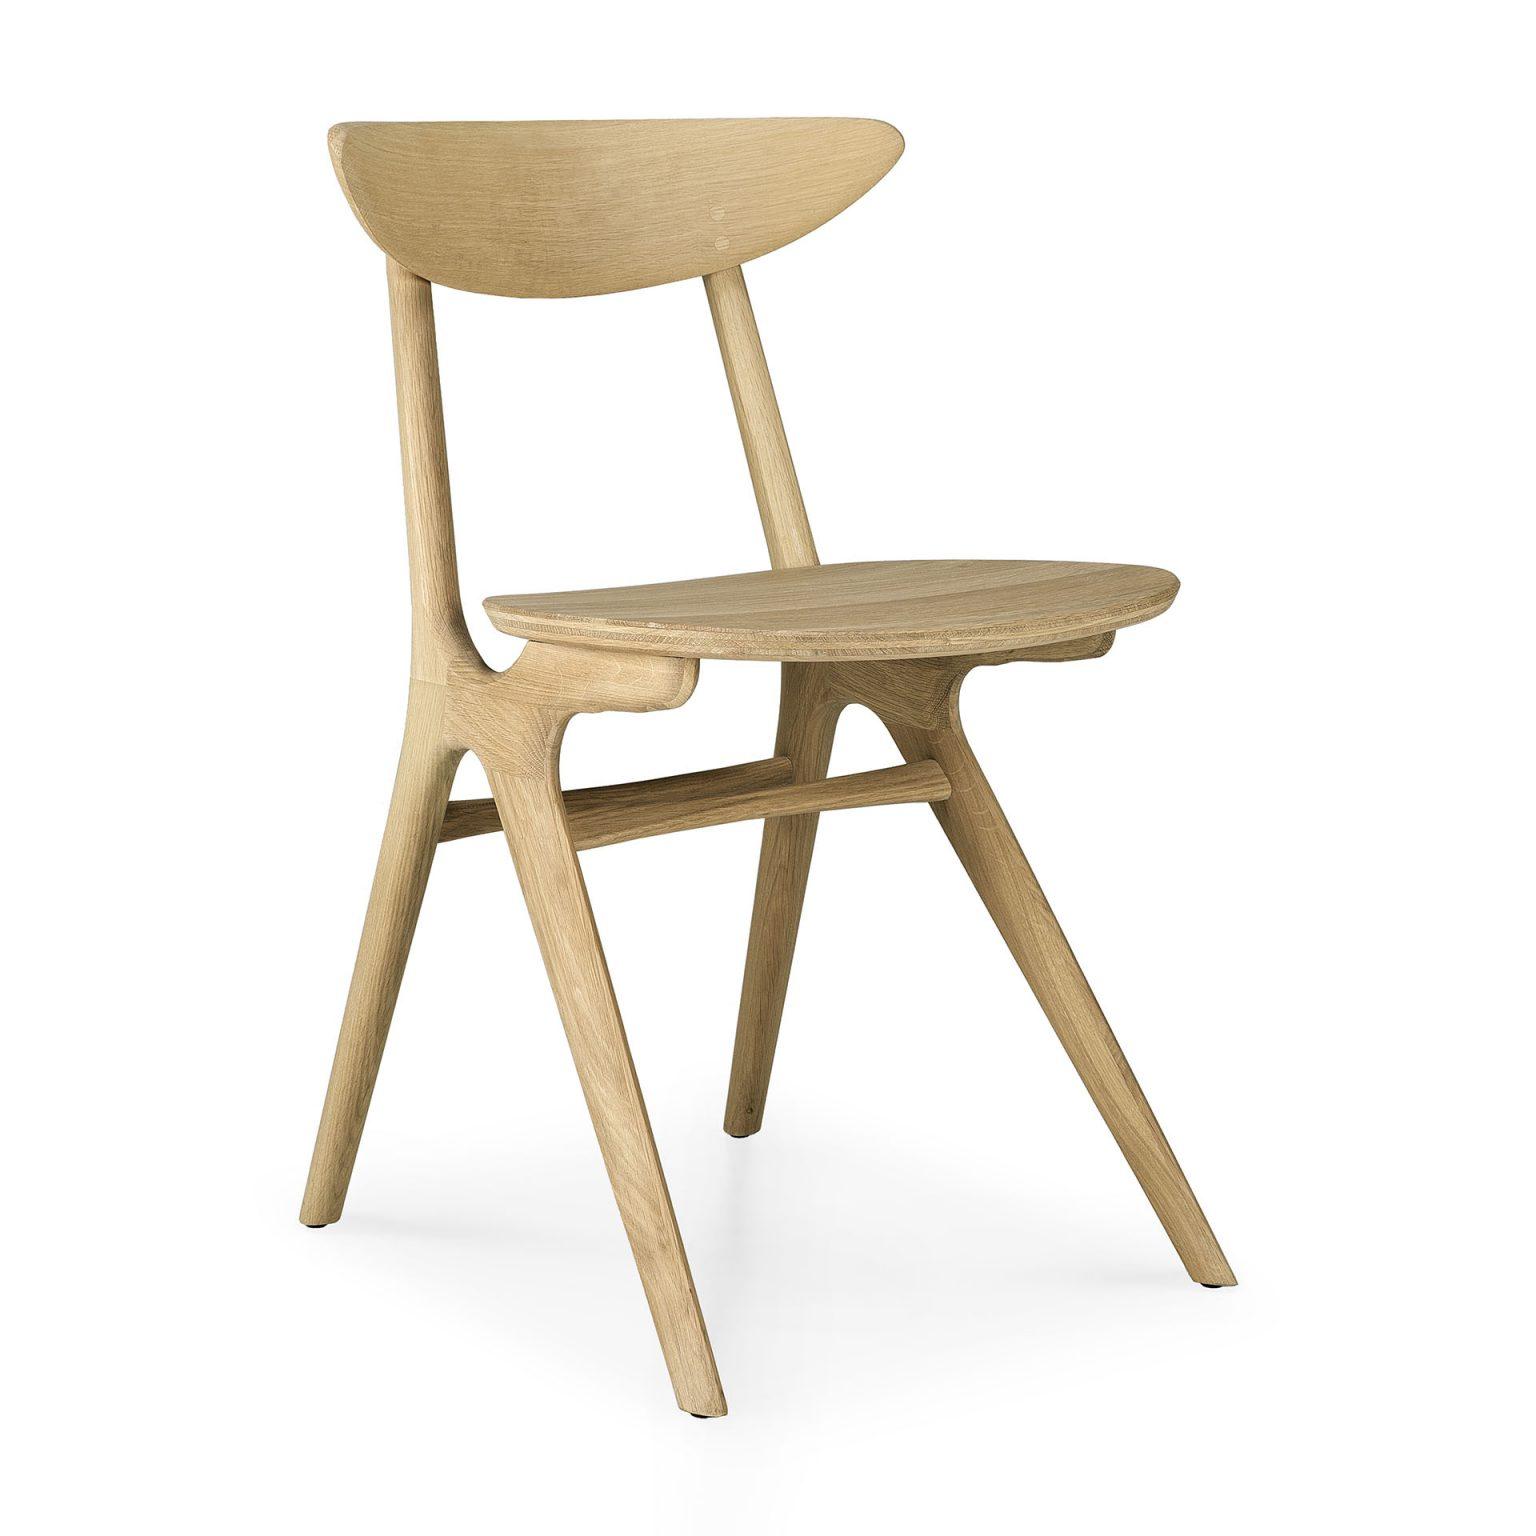 Biennale Interieur - Belgium's leading design and interior event - 50677_oak_eye_dining_chair_side_cut_web.jpg